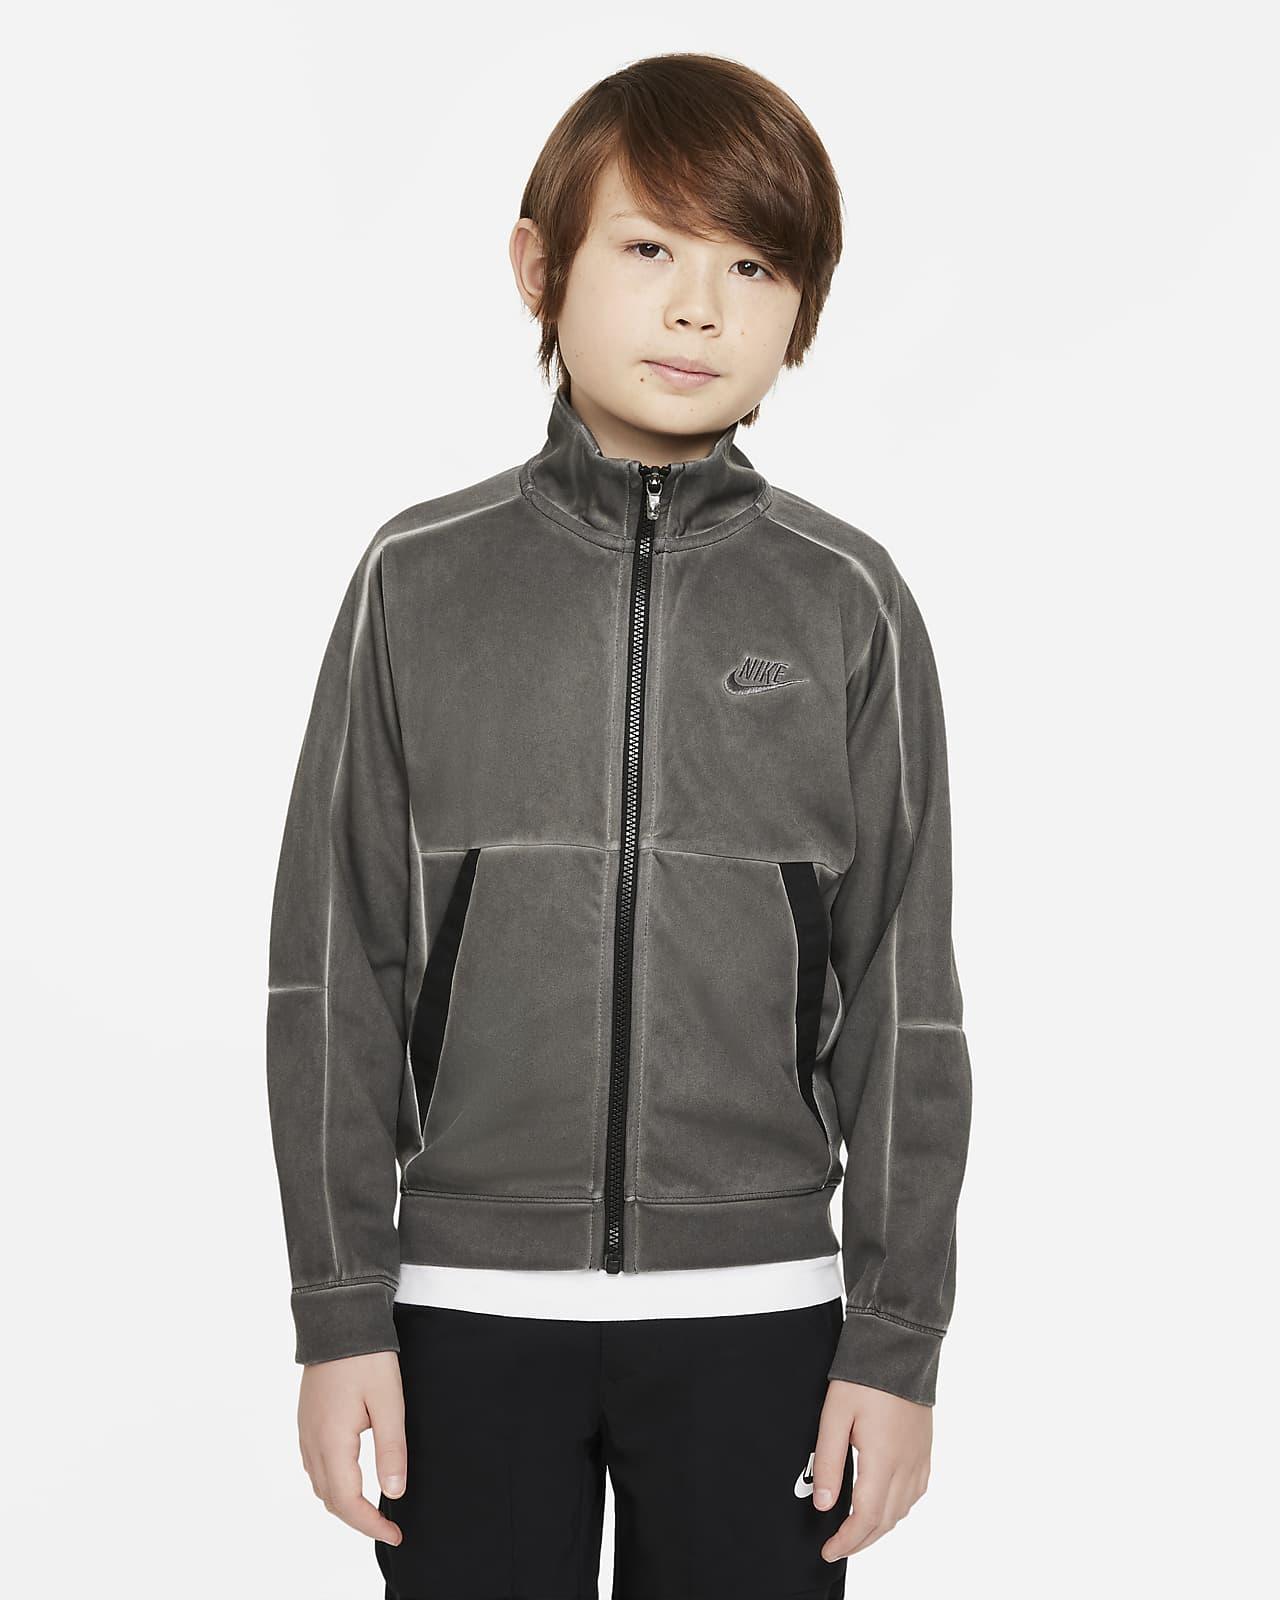 Giacca Nike Sportswear - Ragazzi